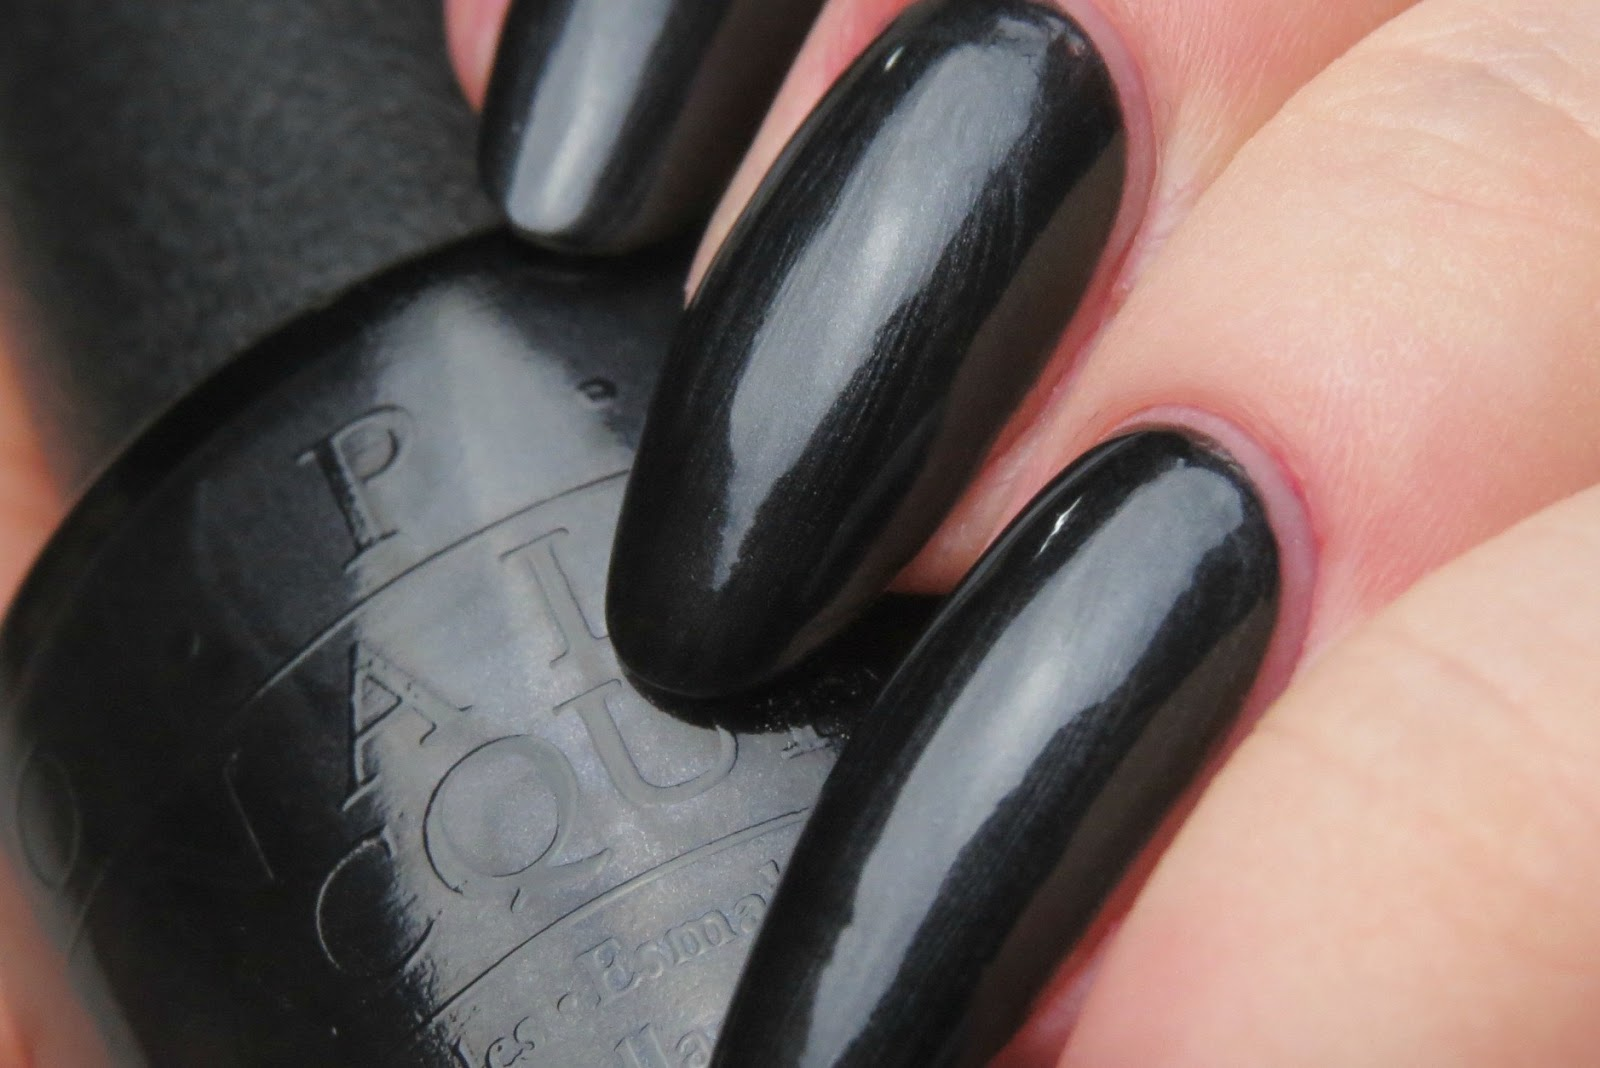 Black dress not optional opi paint